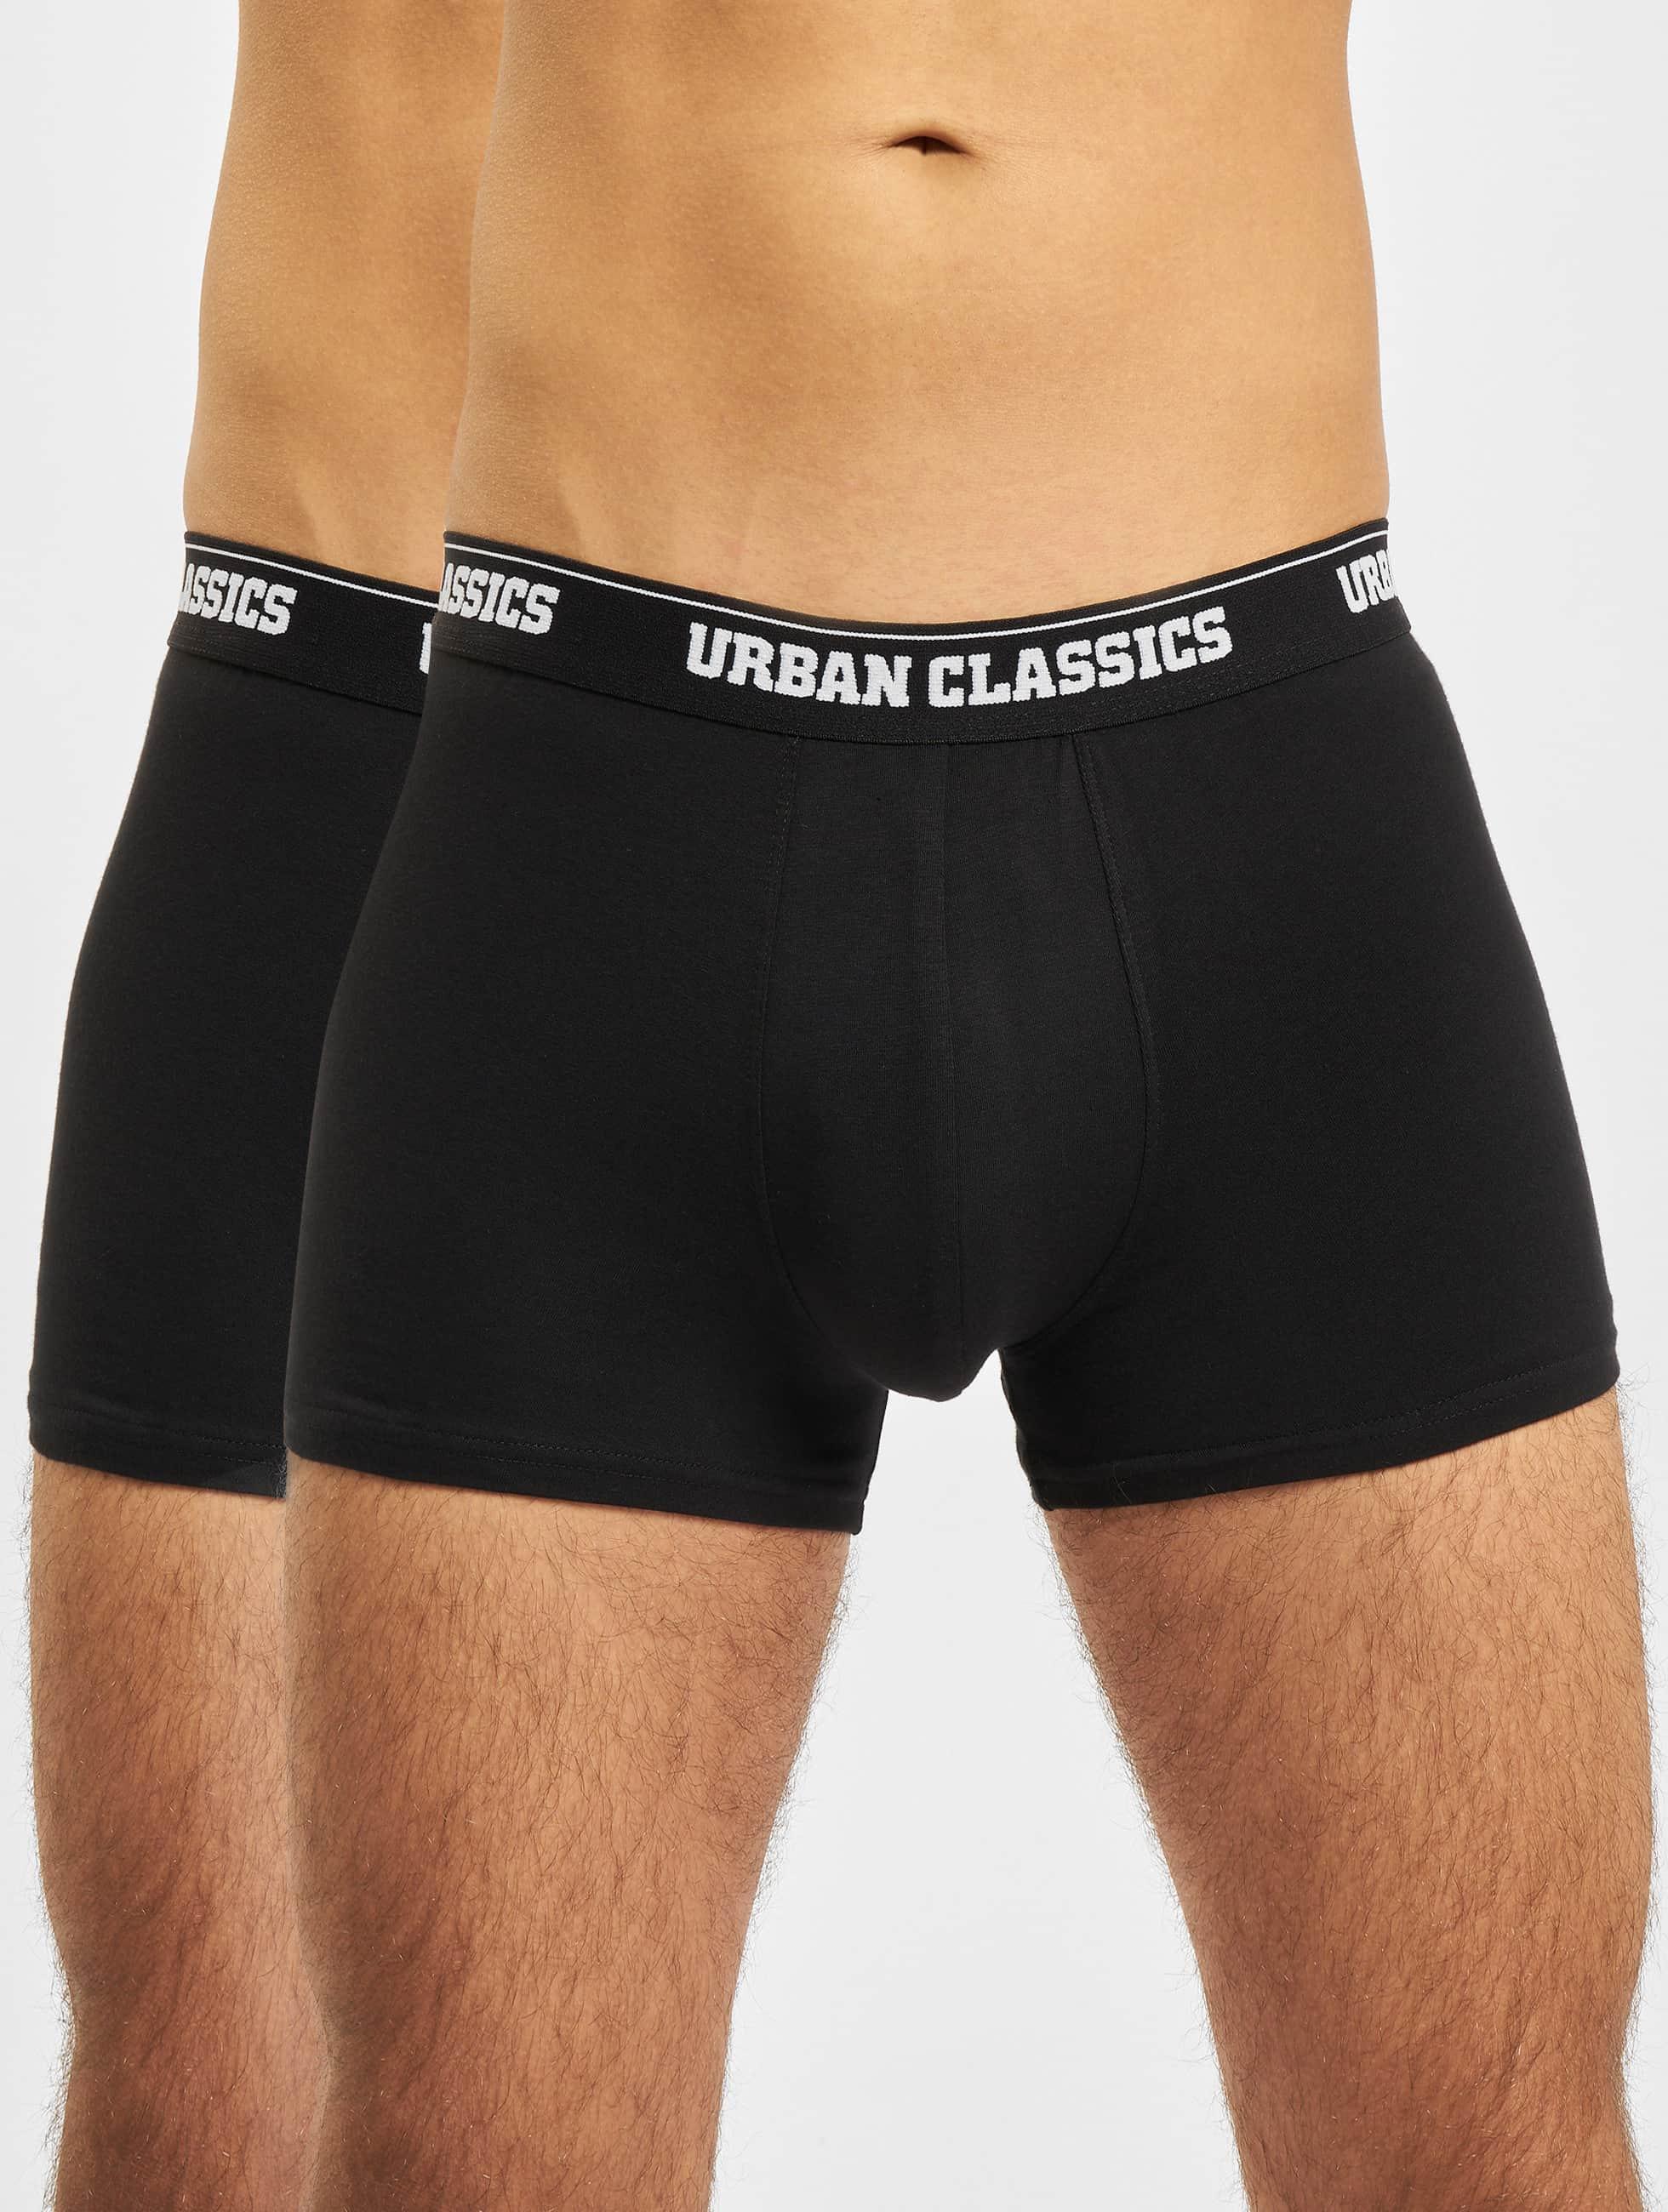 Urban Classics Bokserki Mens Double Pack czarny